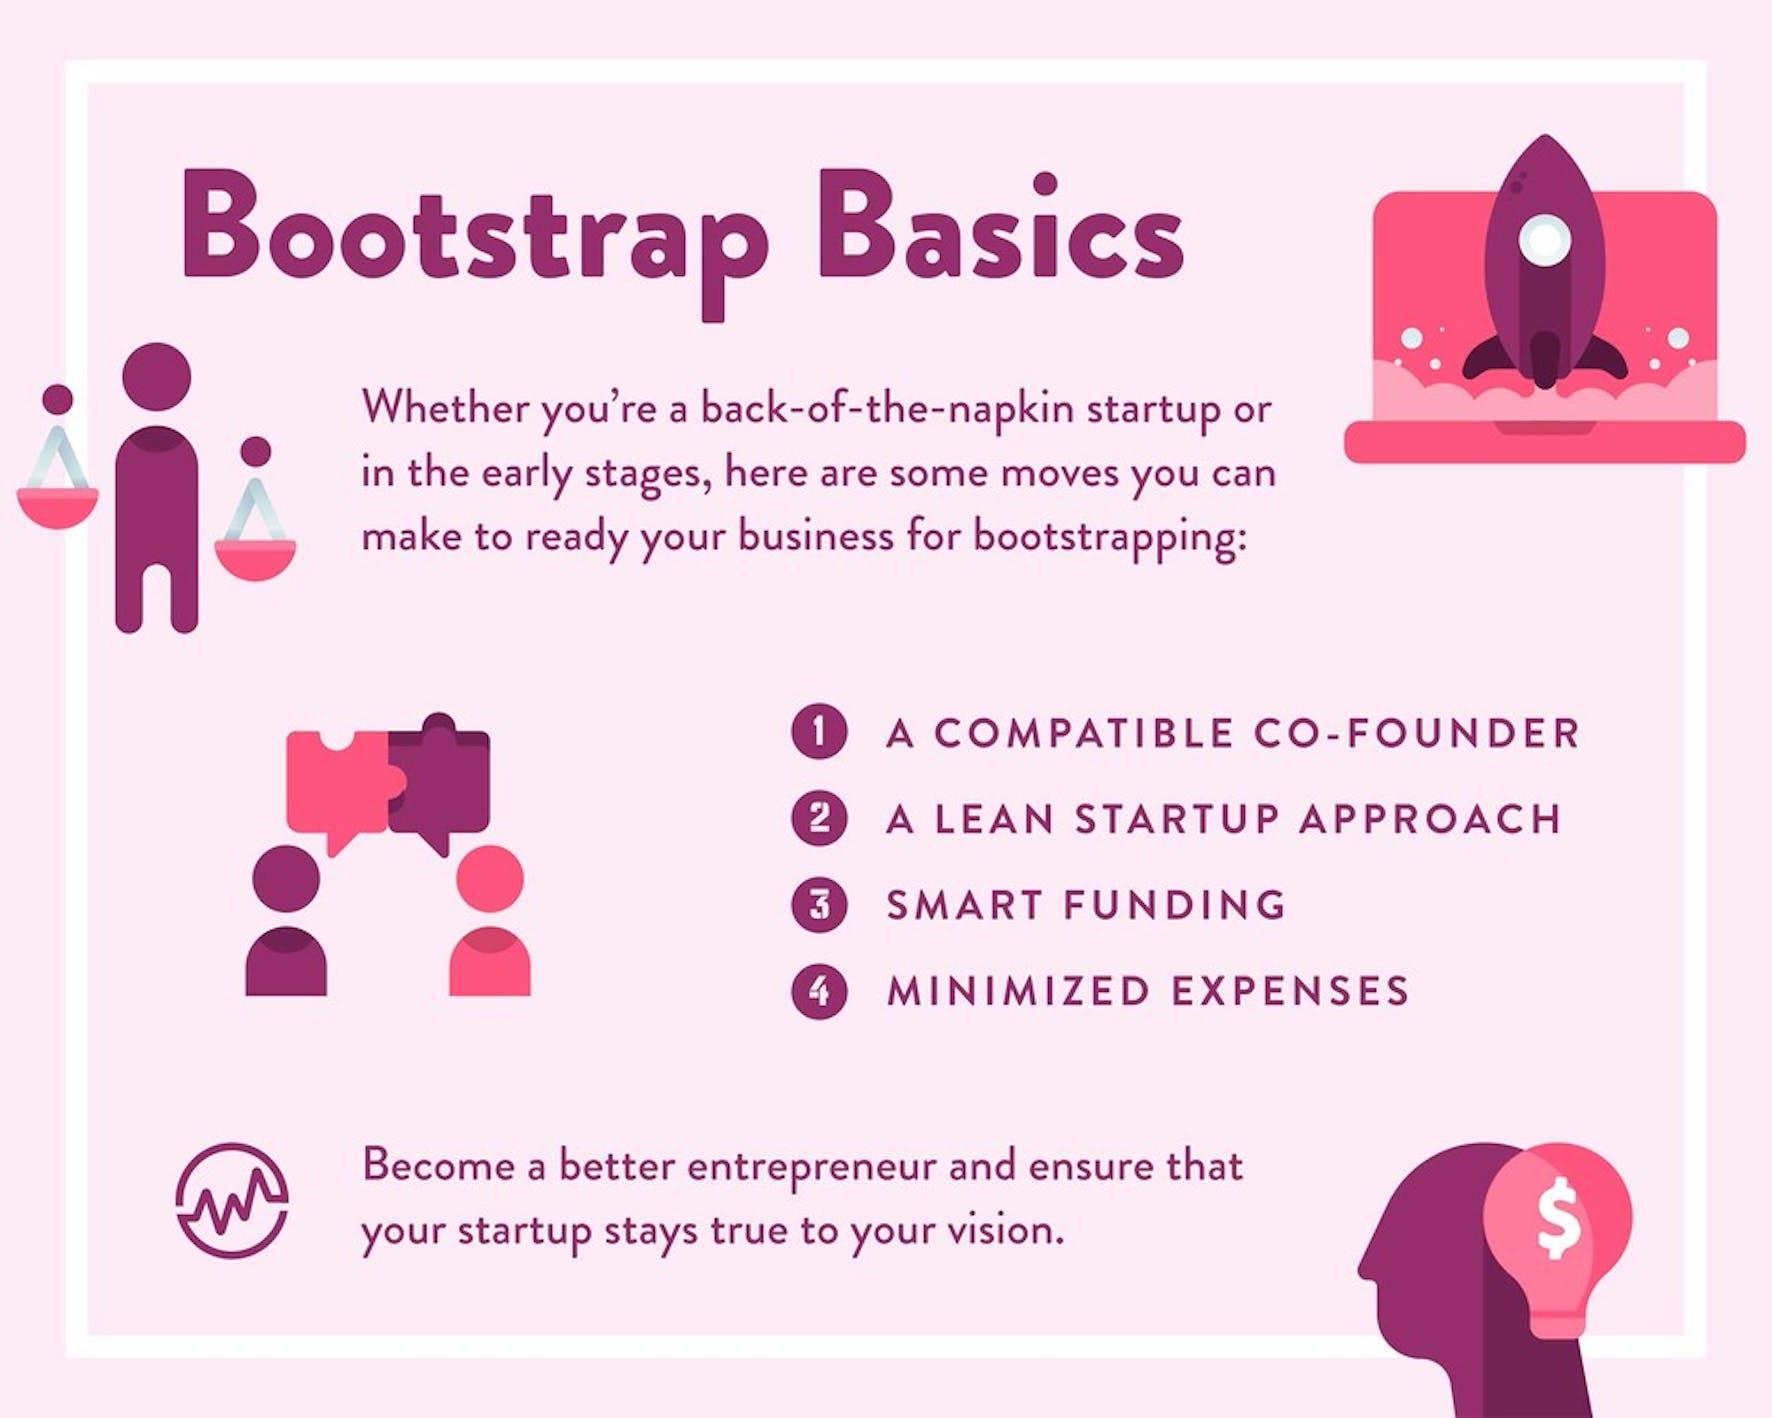 Bootstrap basics chart